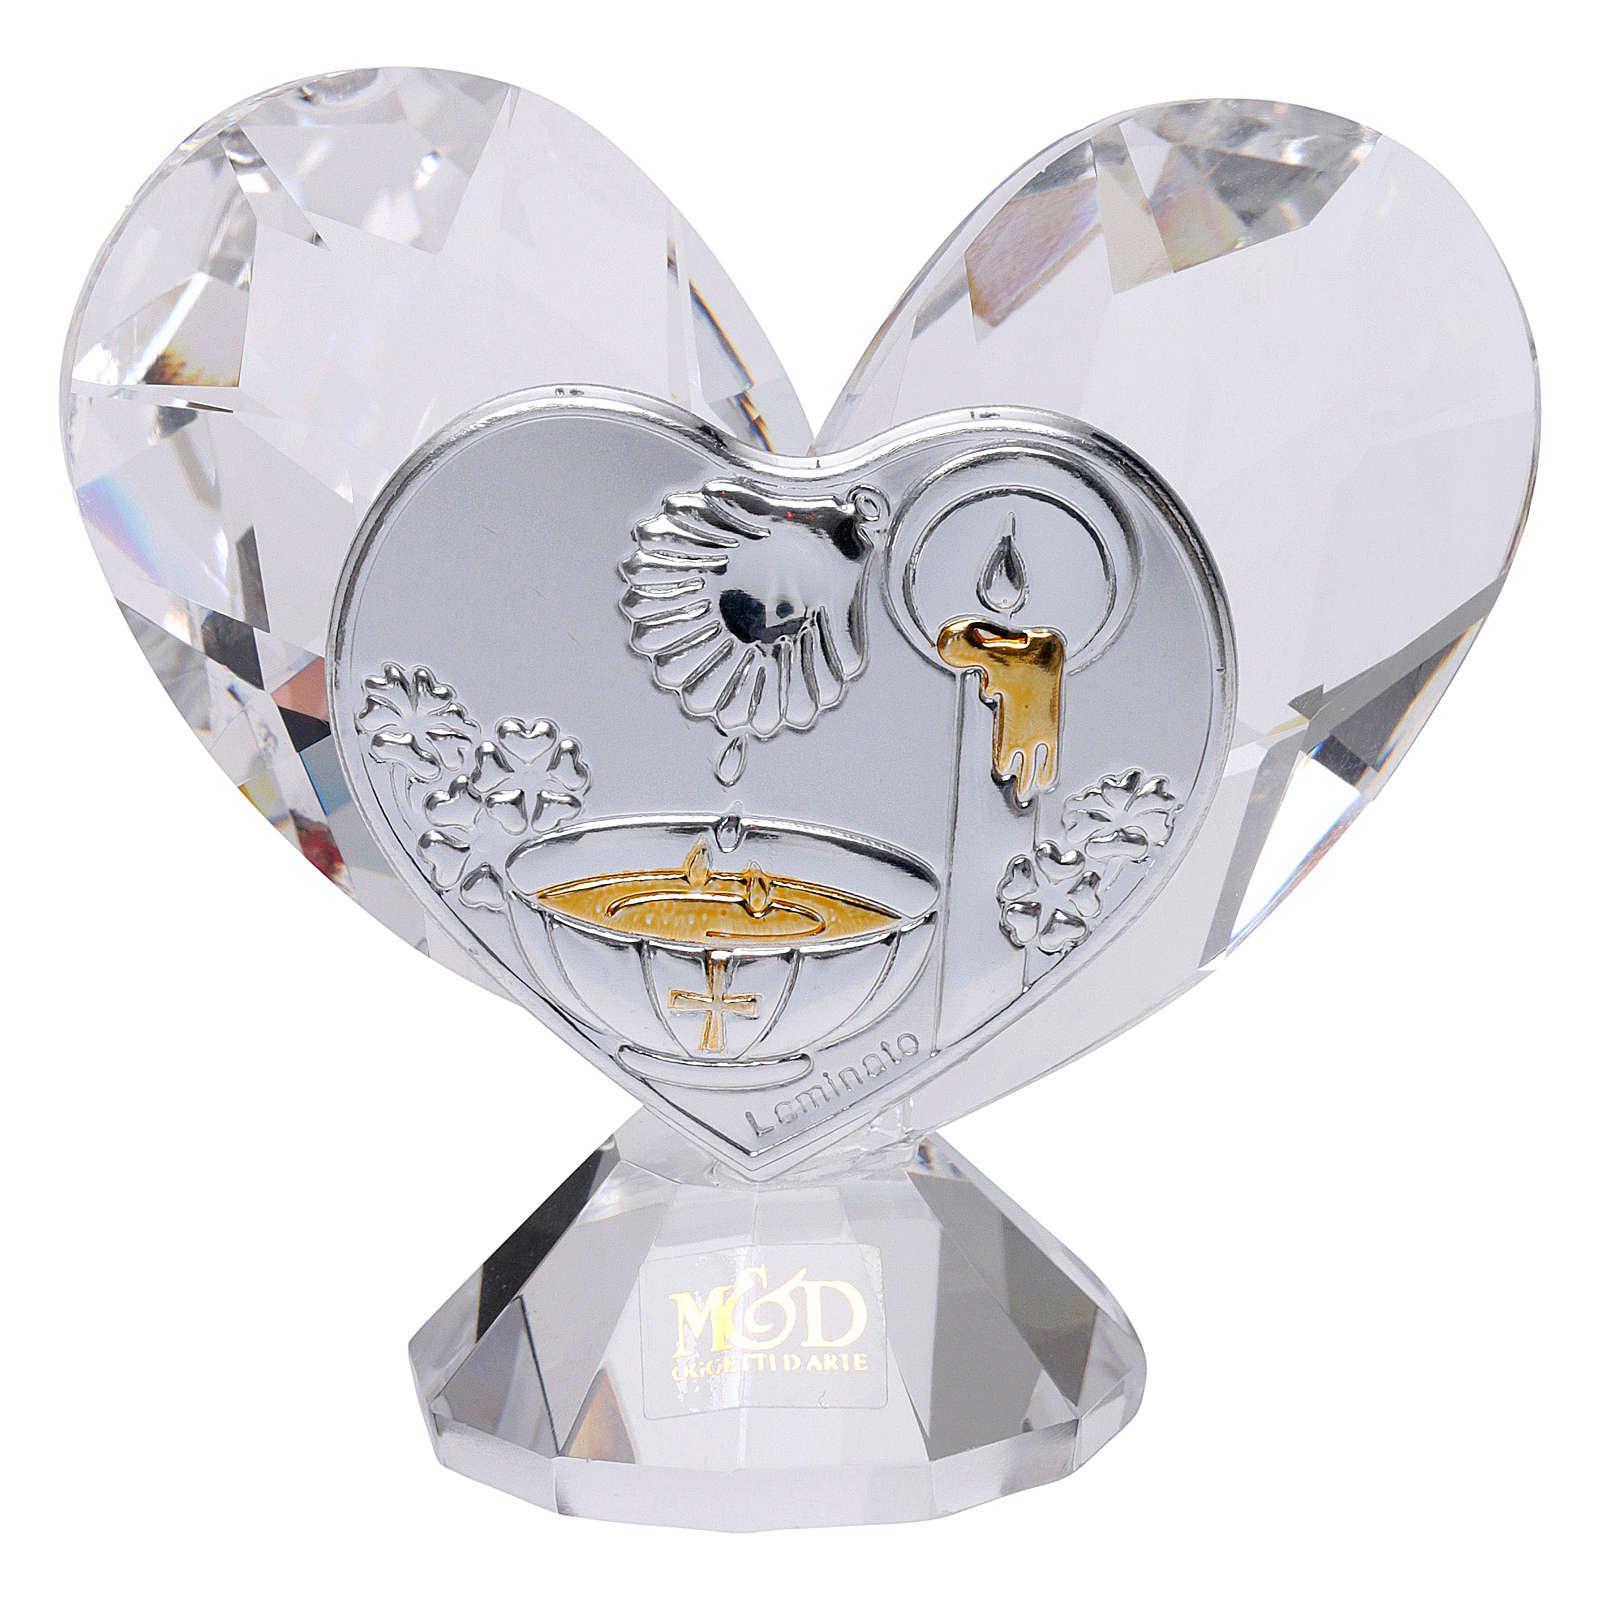 Pamiątka Chrztu serce 5x5 cm 3